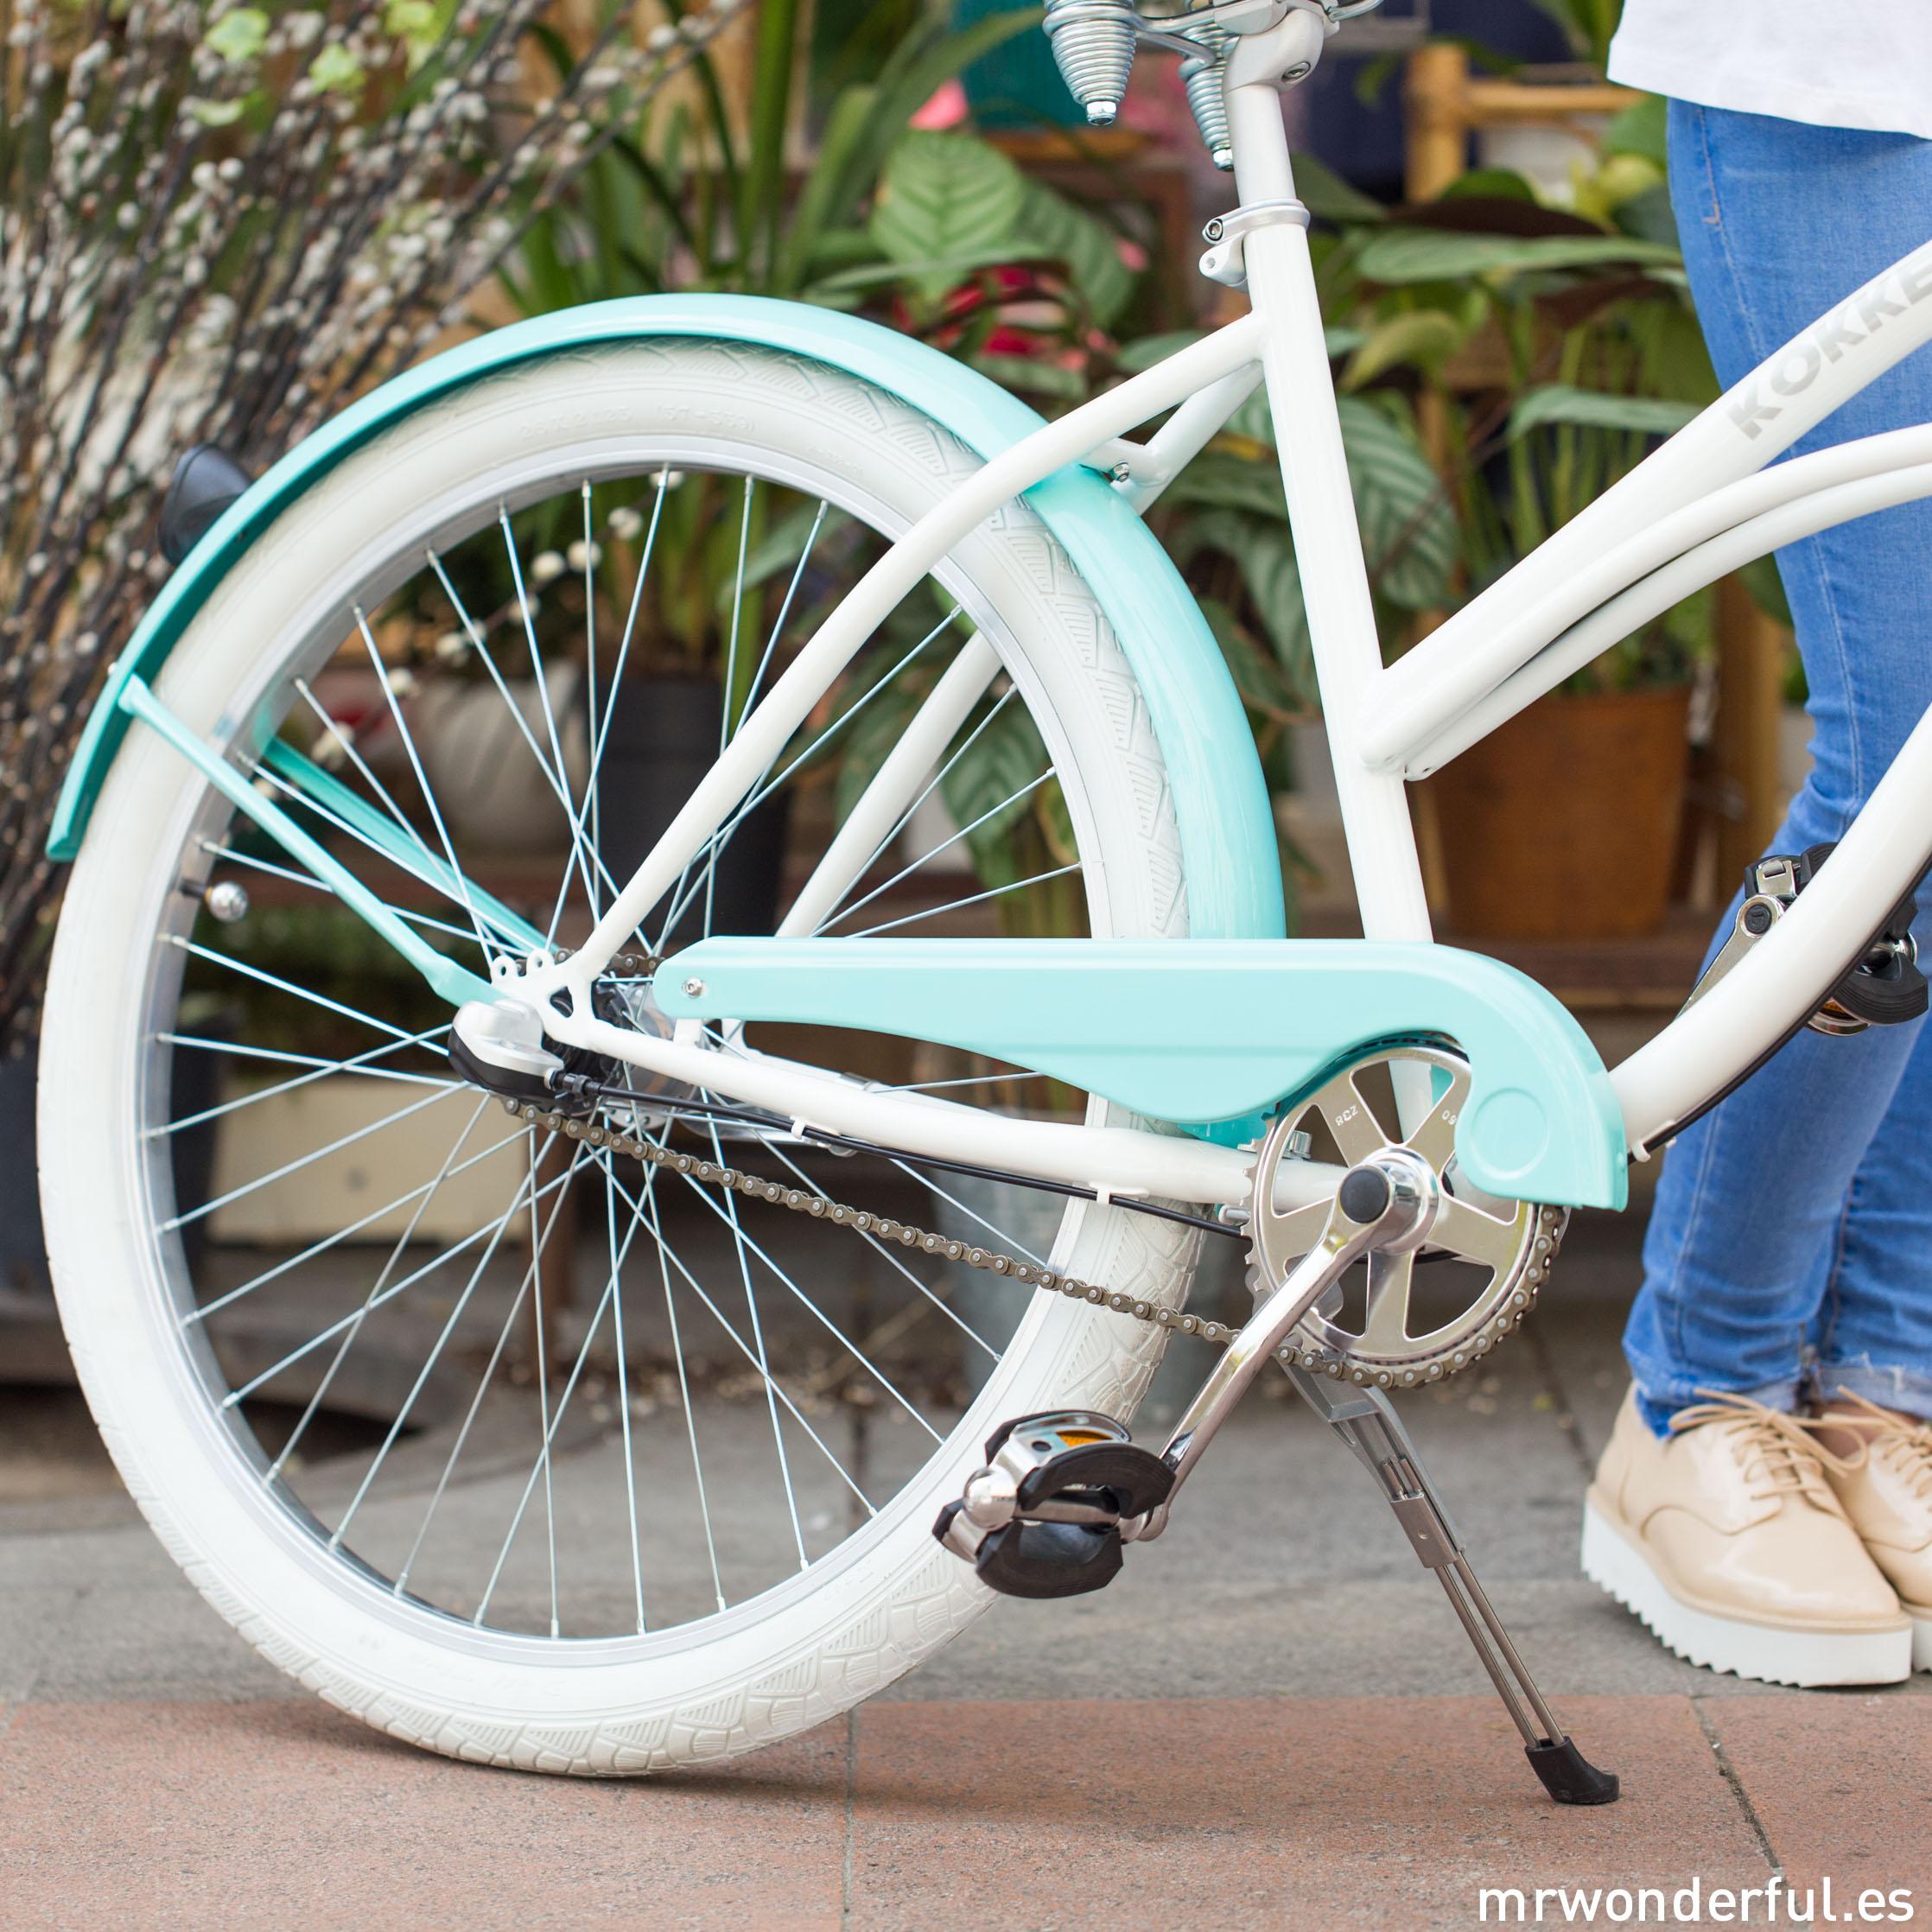 mrwonderful_concurso-bicicleta-5-Editar